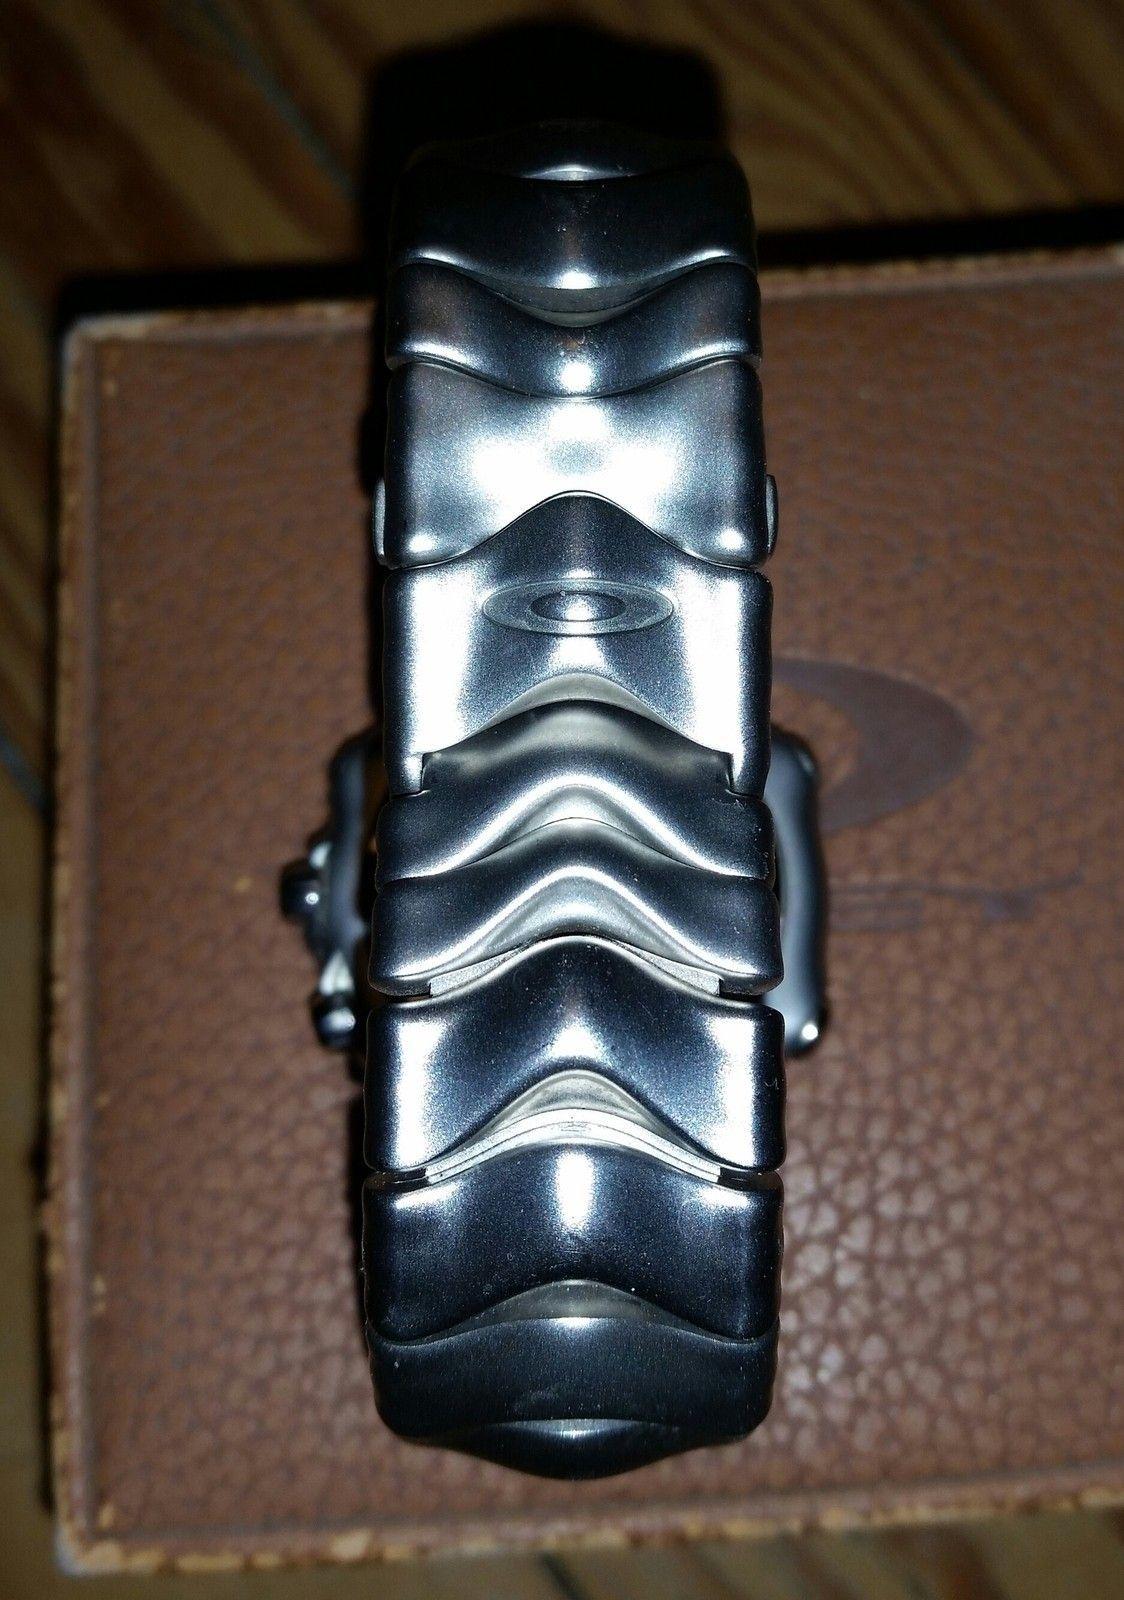 GMT Silver with Blue Face - uploadfromtaptalk1416890288840.jpg